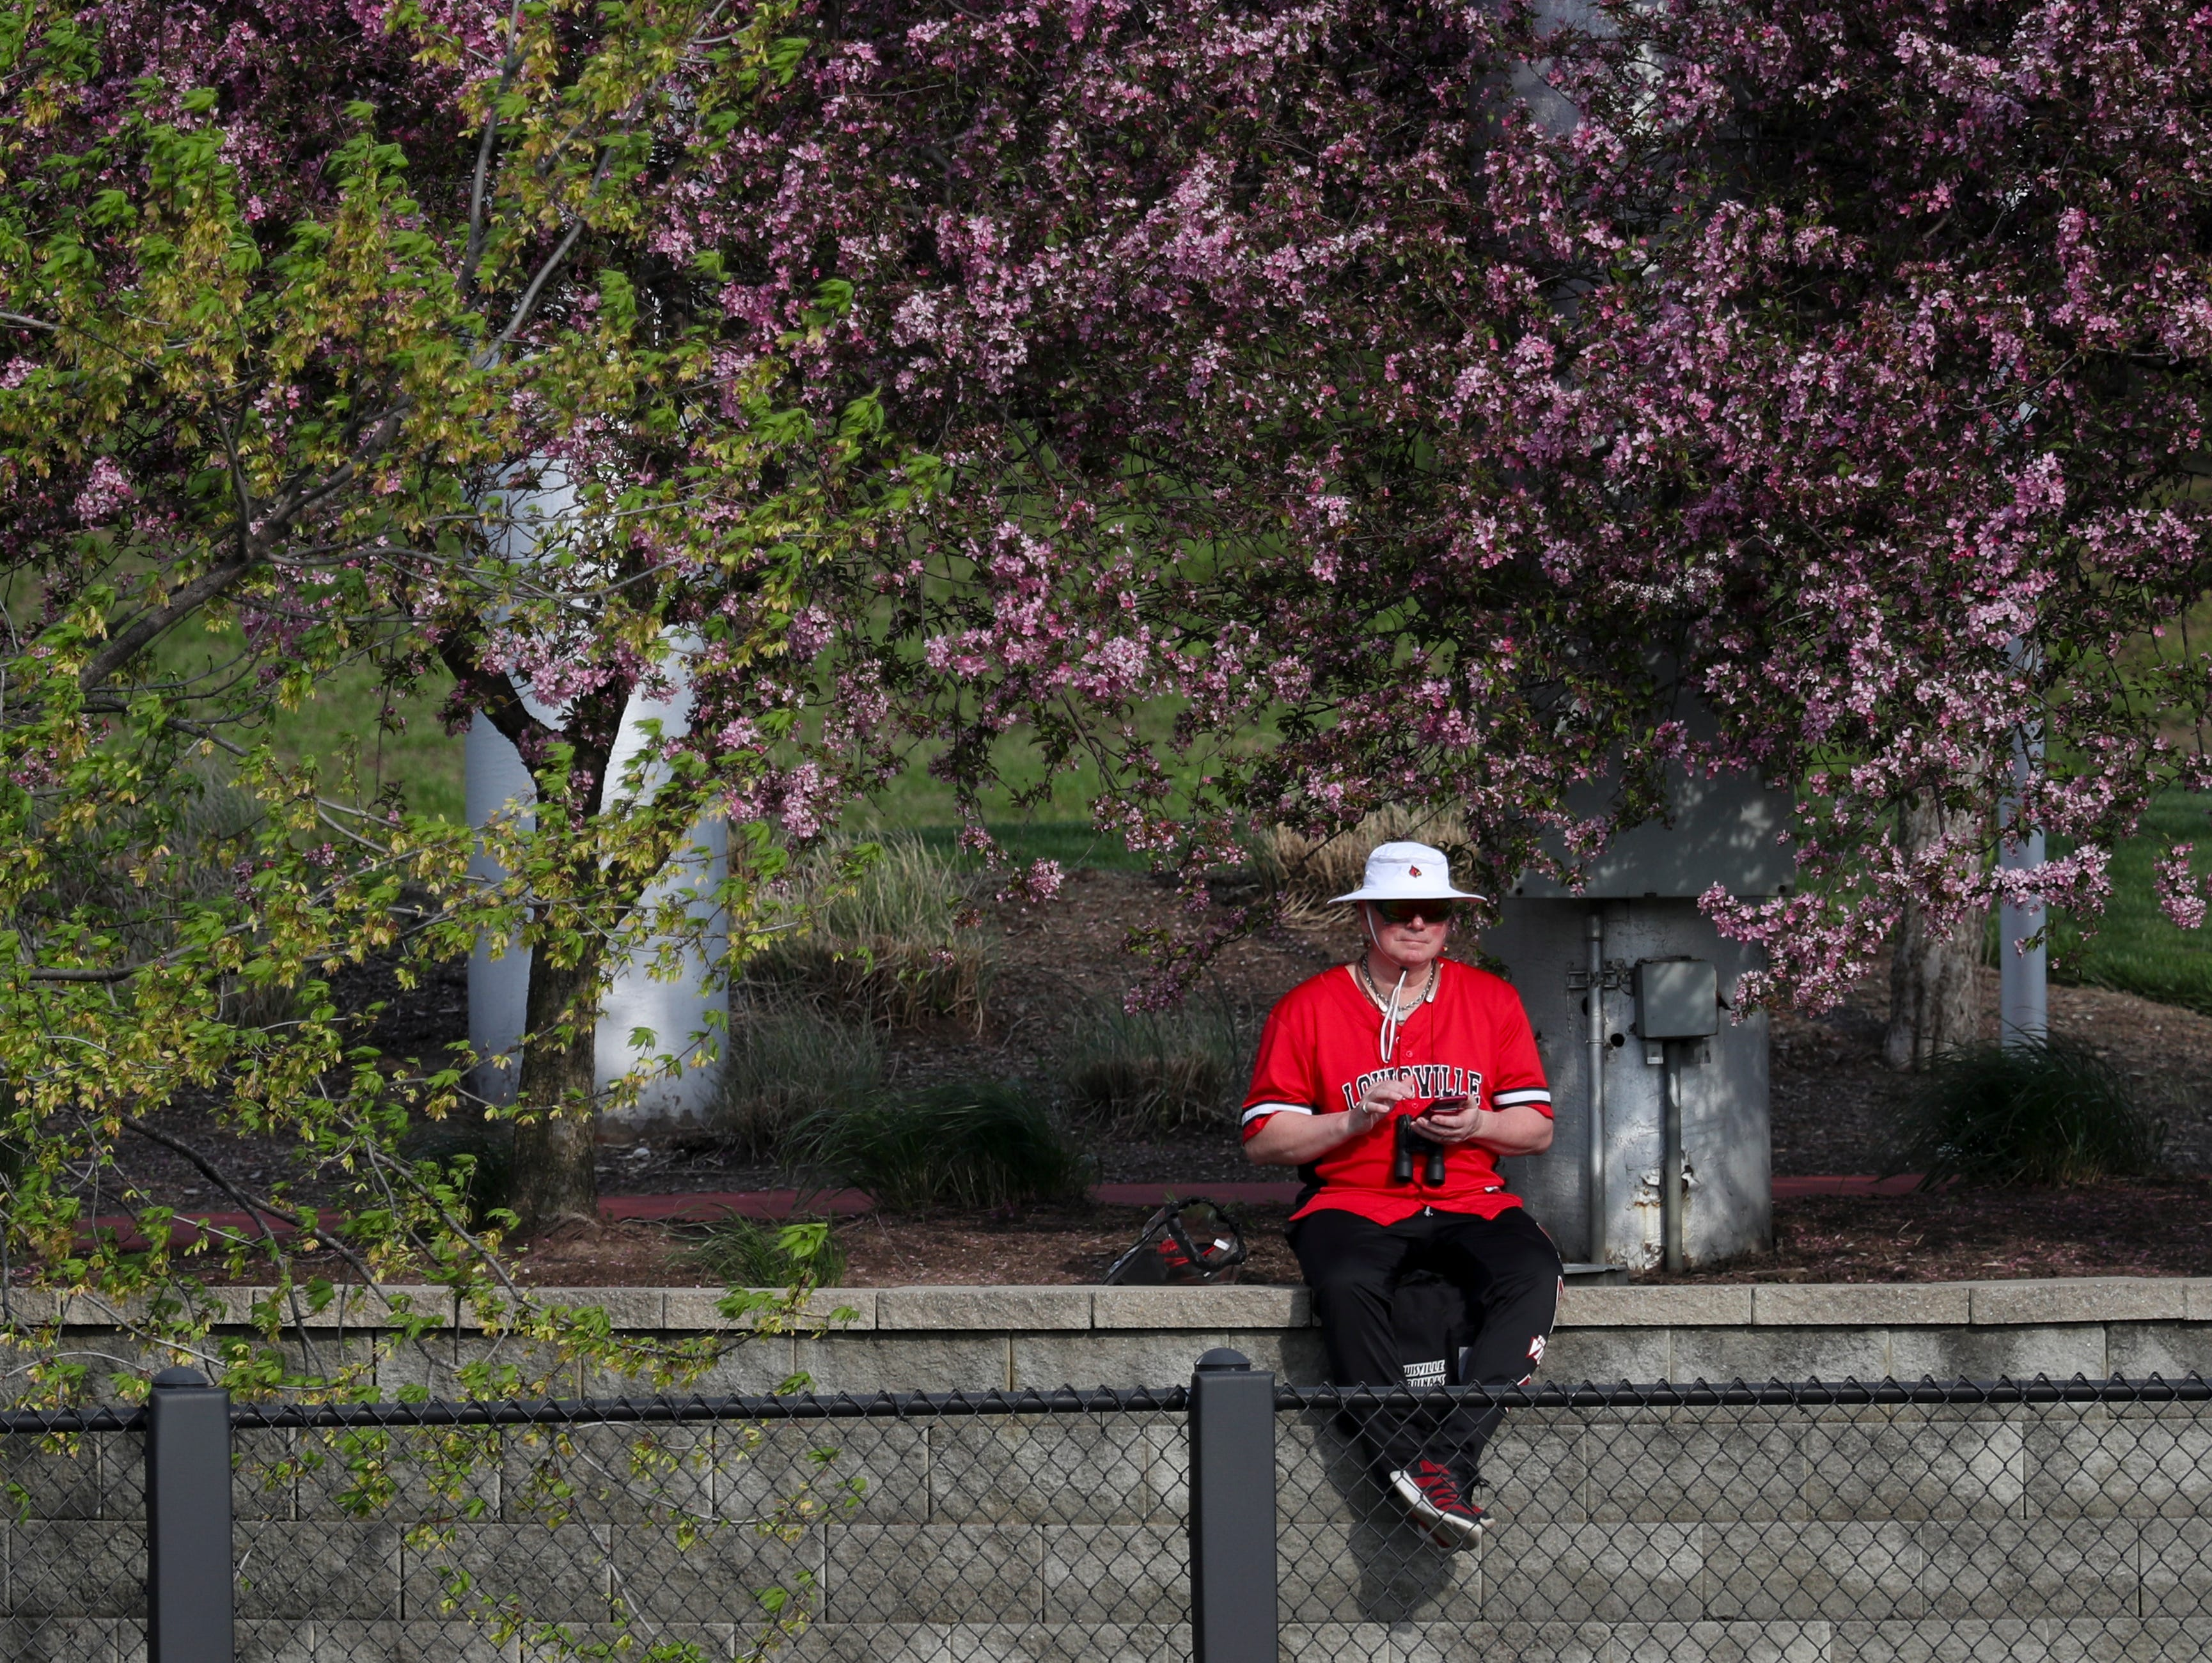 Louisville fans watch the Cards battle Kentucky on April 17.